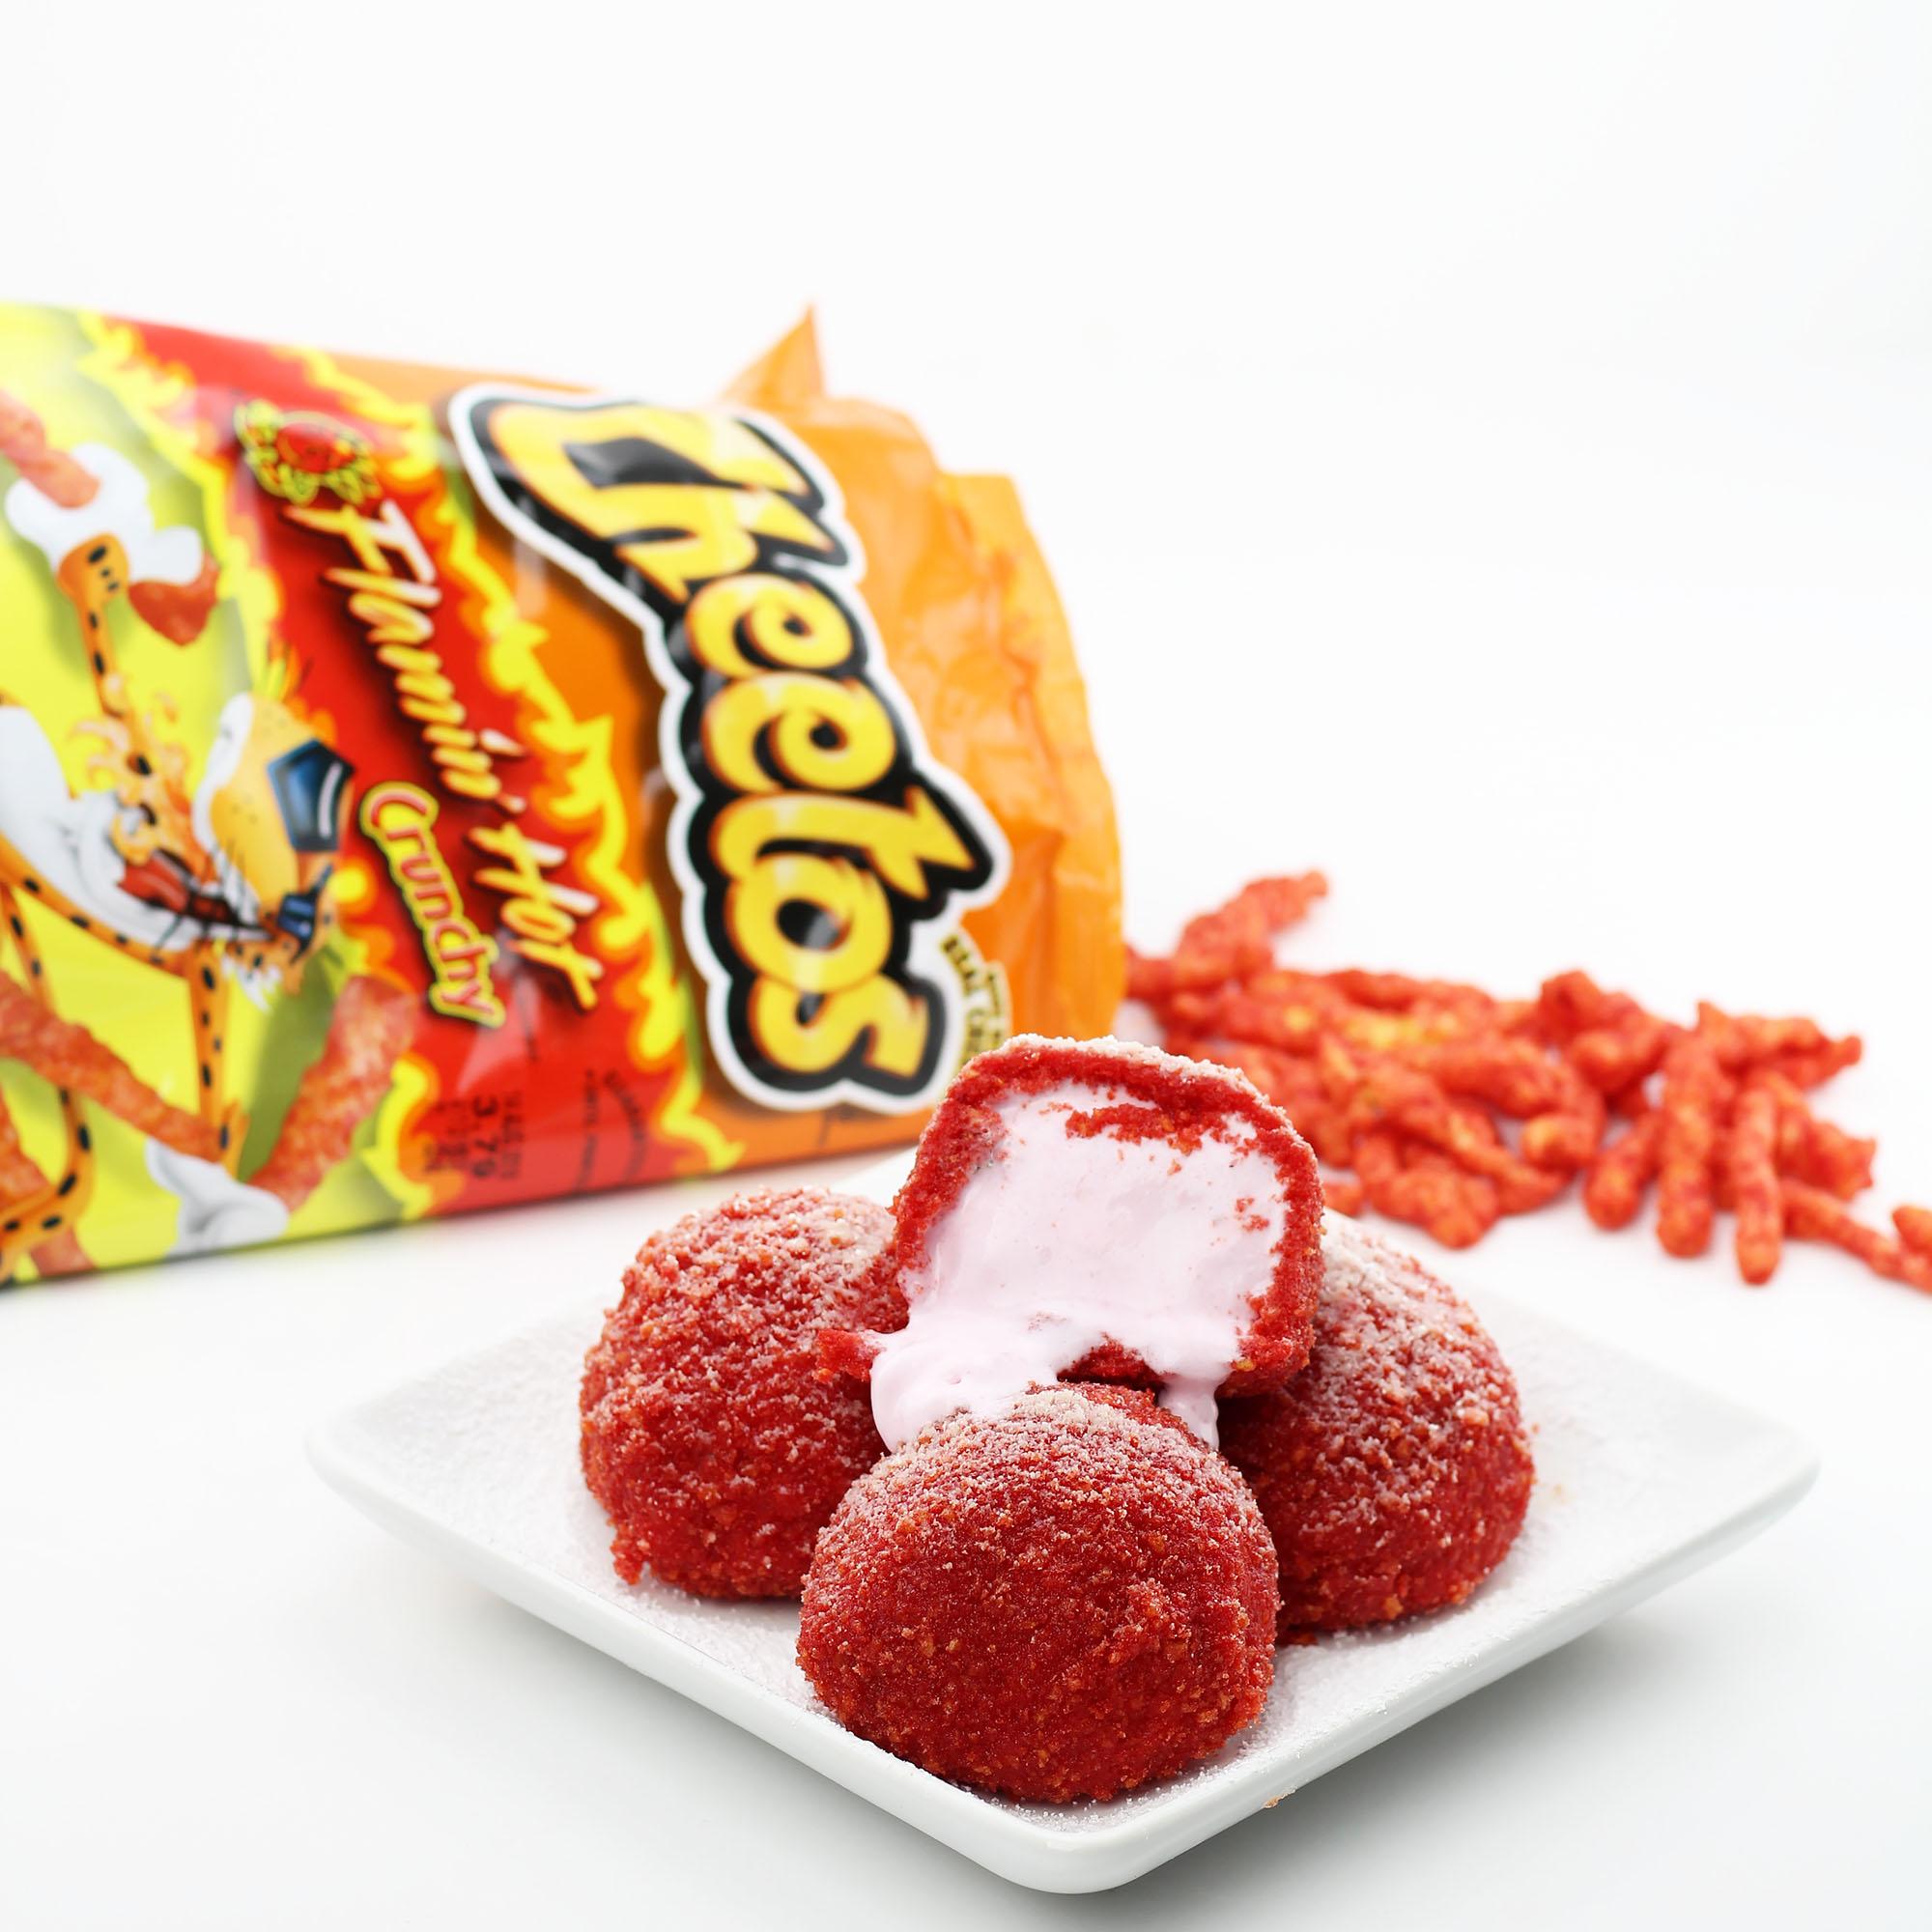 Flamin Hot Cheetos Breaded Deep Fried Ice Cream Dudefoods Com